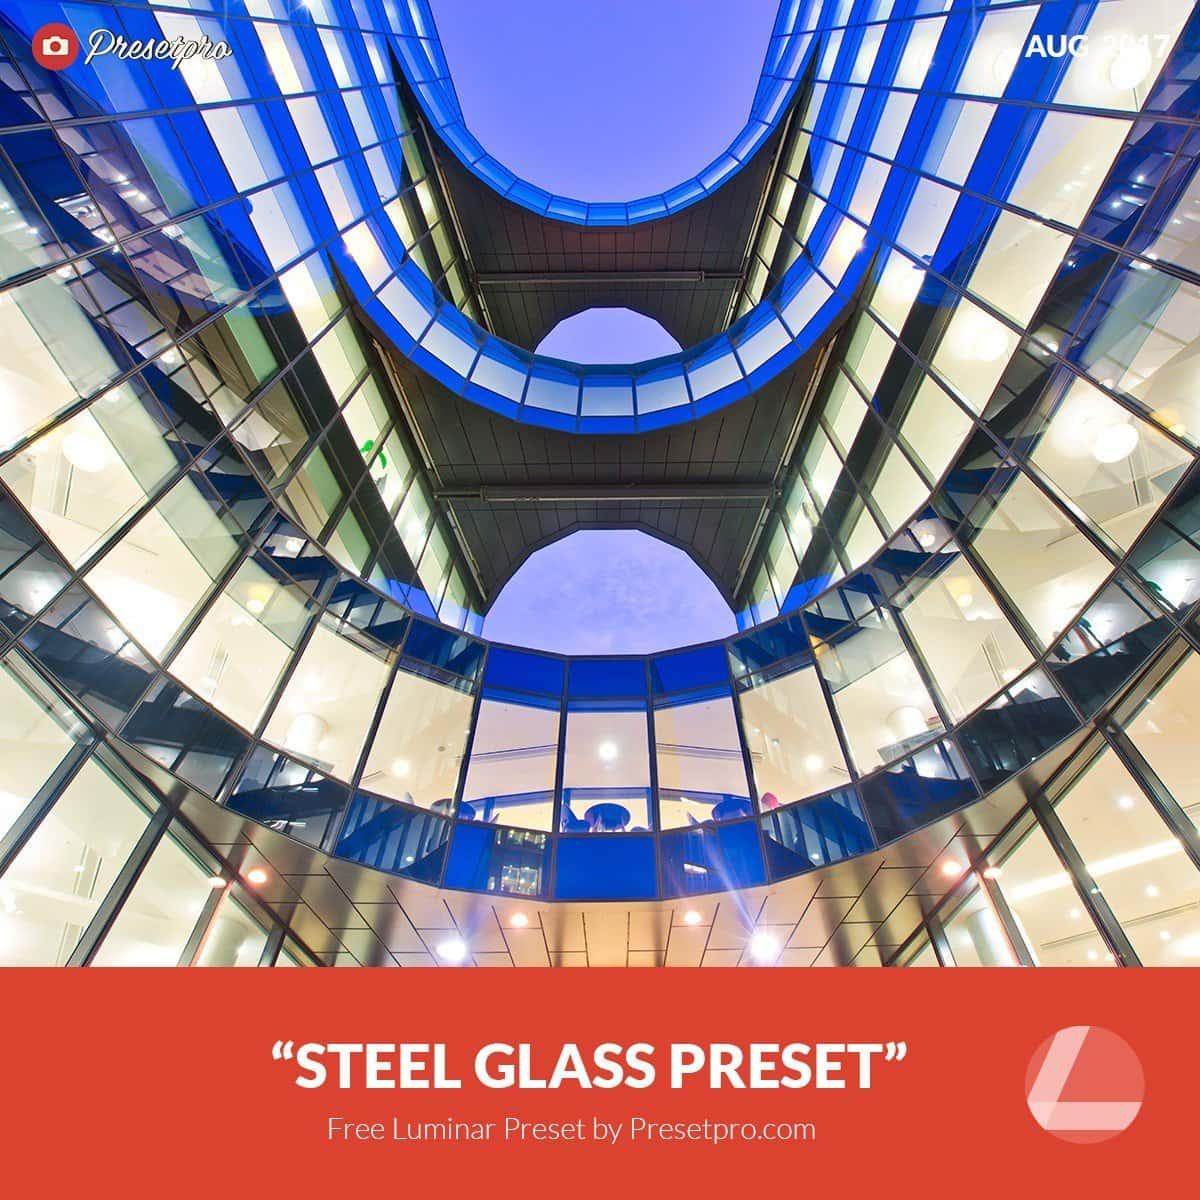 Free-Luminar-Preset-Steel-n-Glass-Presetpro.com